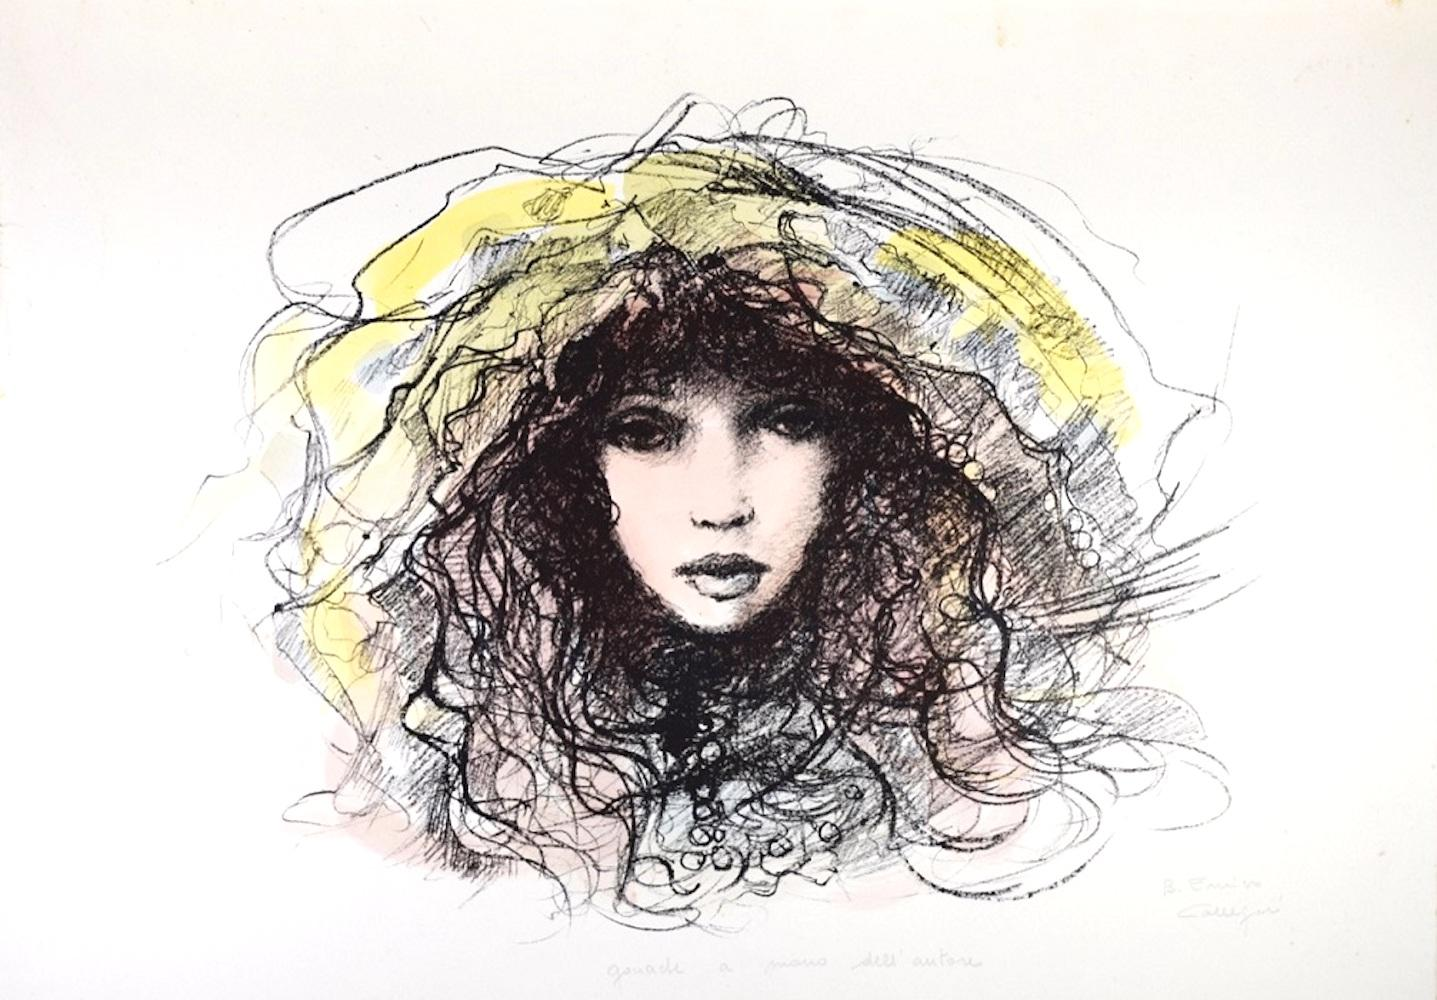 Face of Woman - Original Lithograph by B.E. Callegari - 1980s